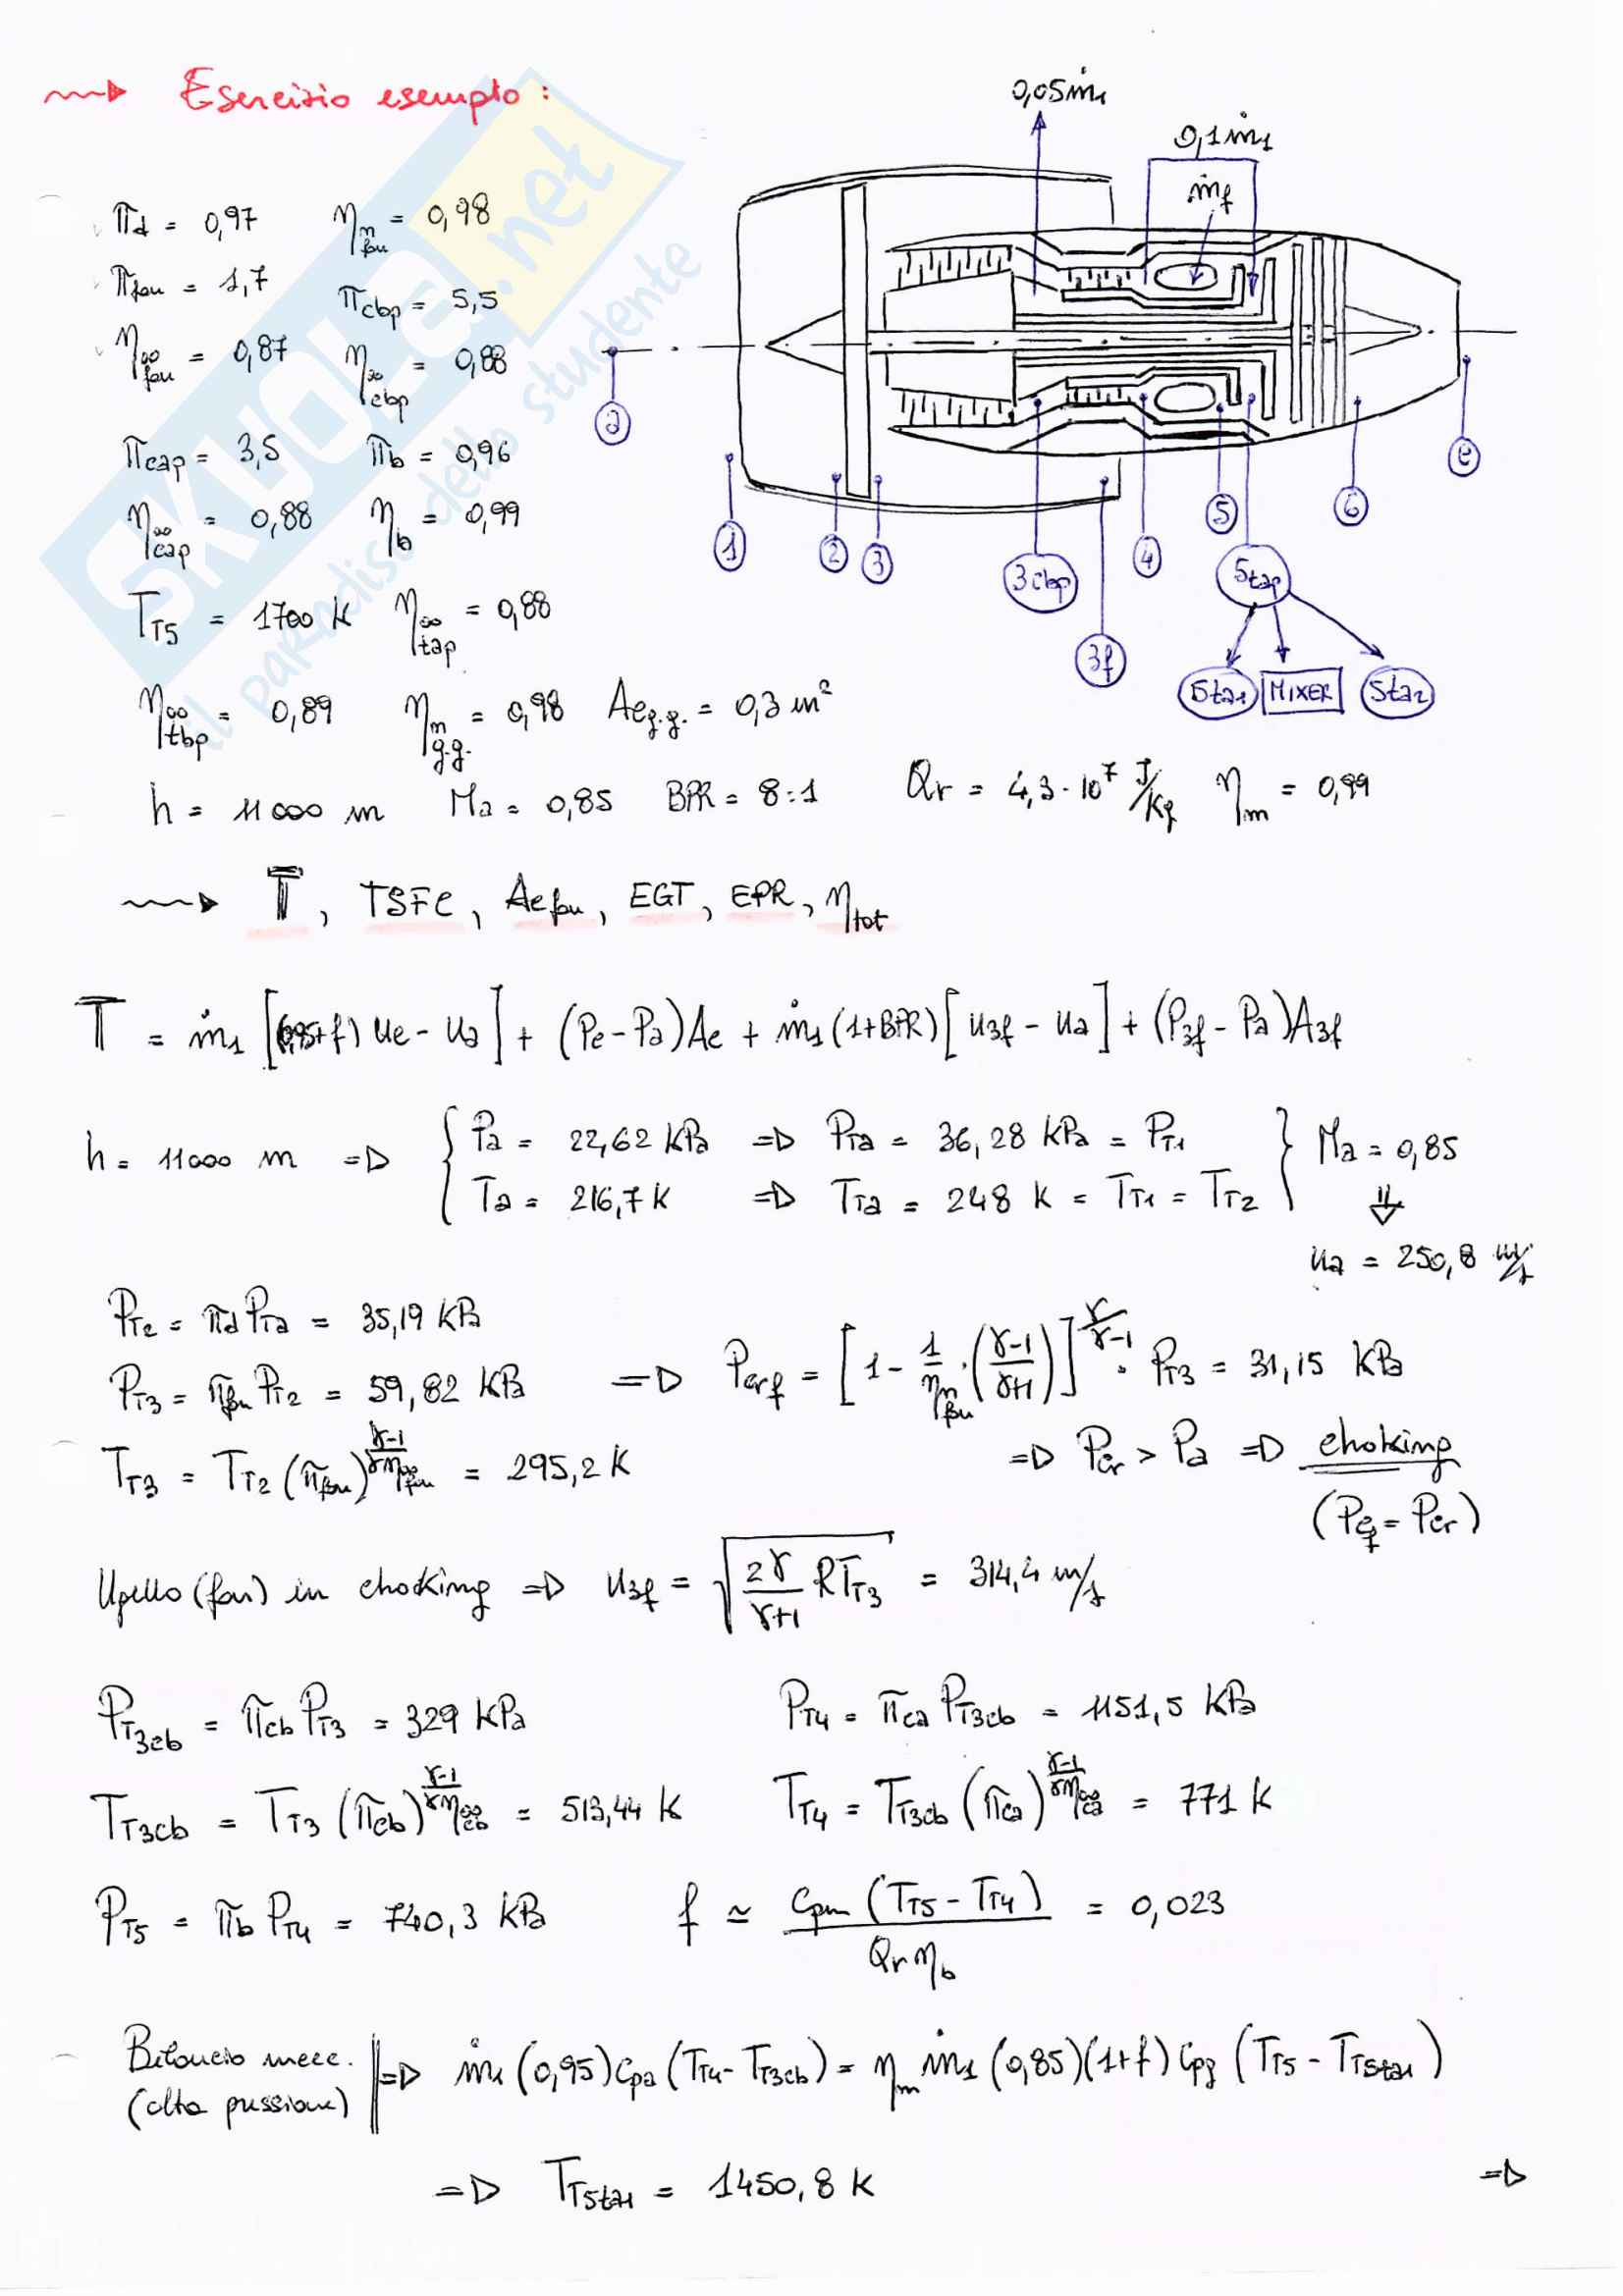 Motori Per Aeromobili Pag. 41